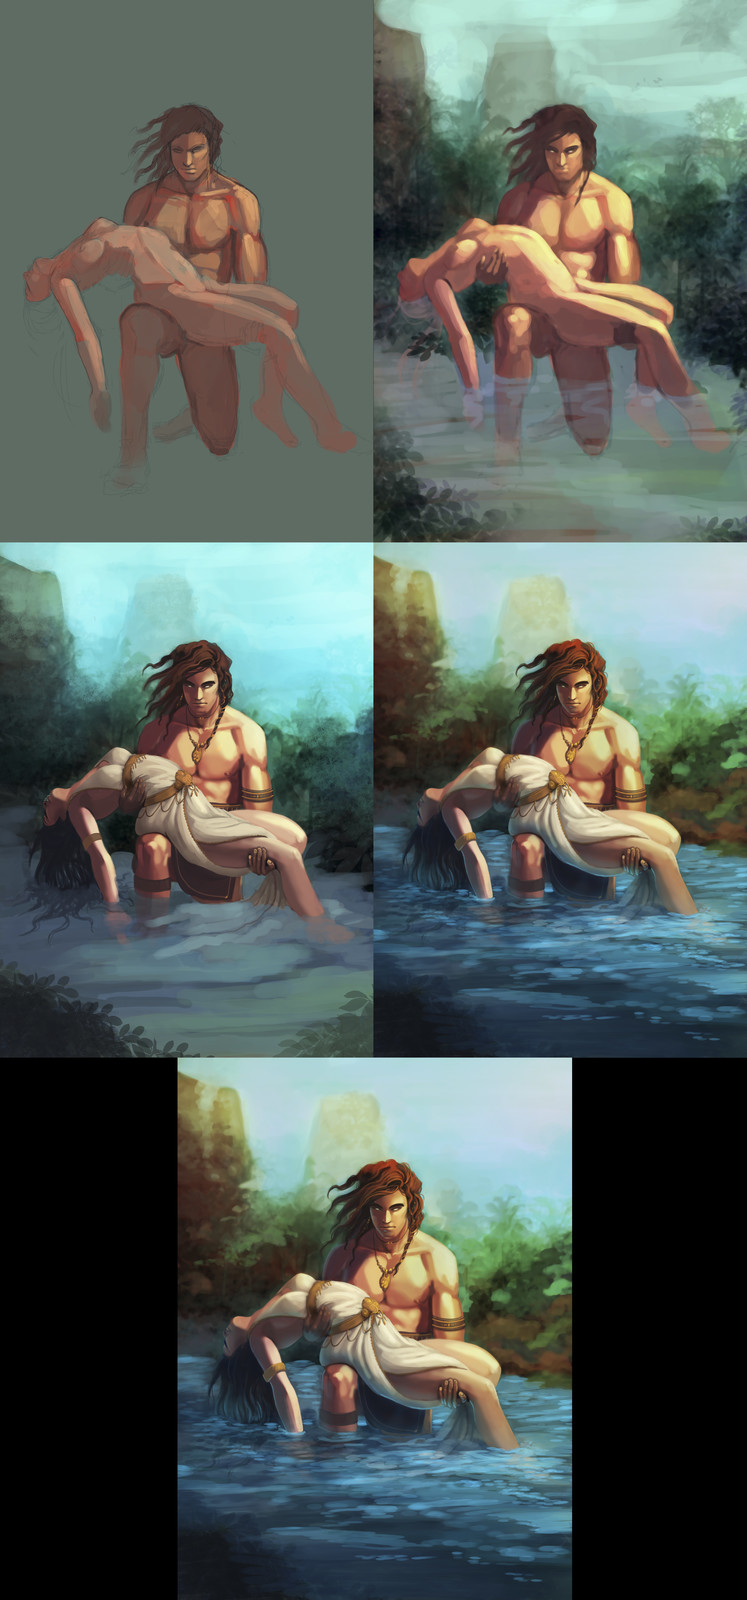 The Lake Process